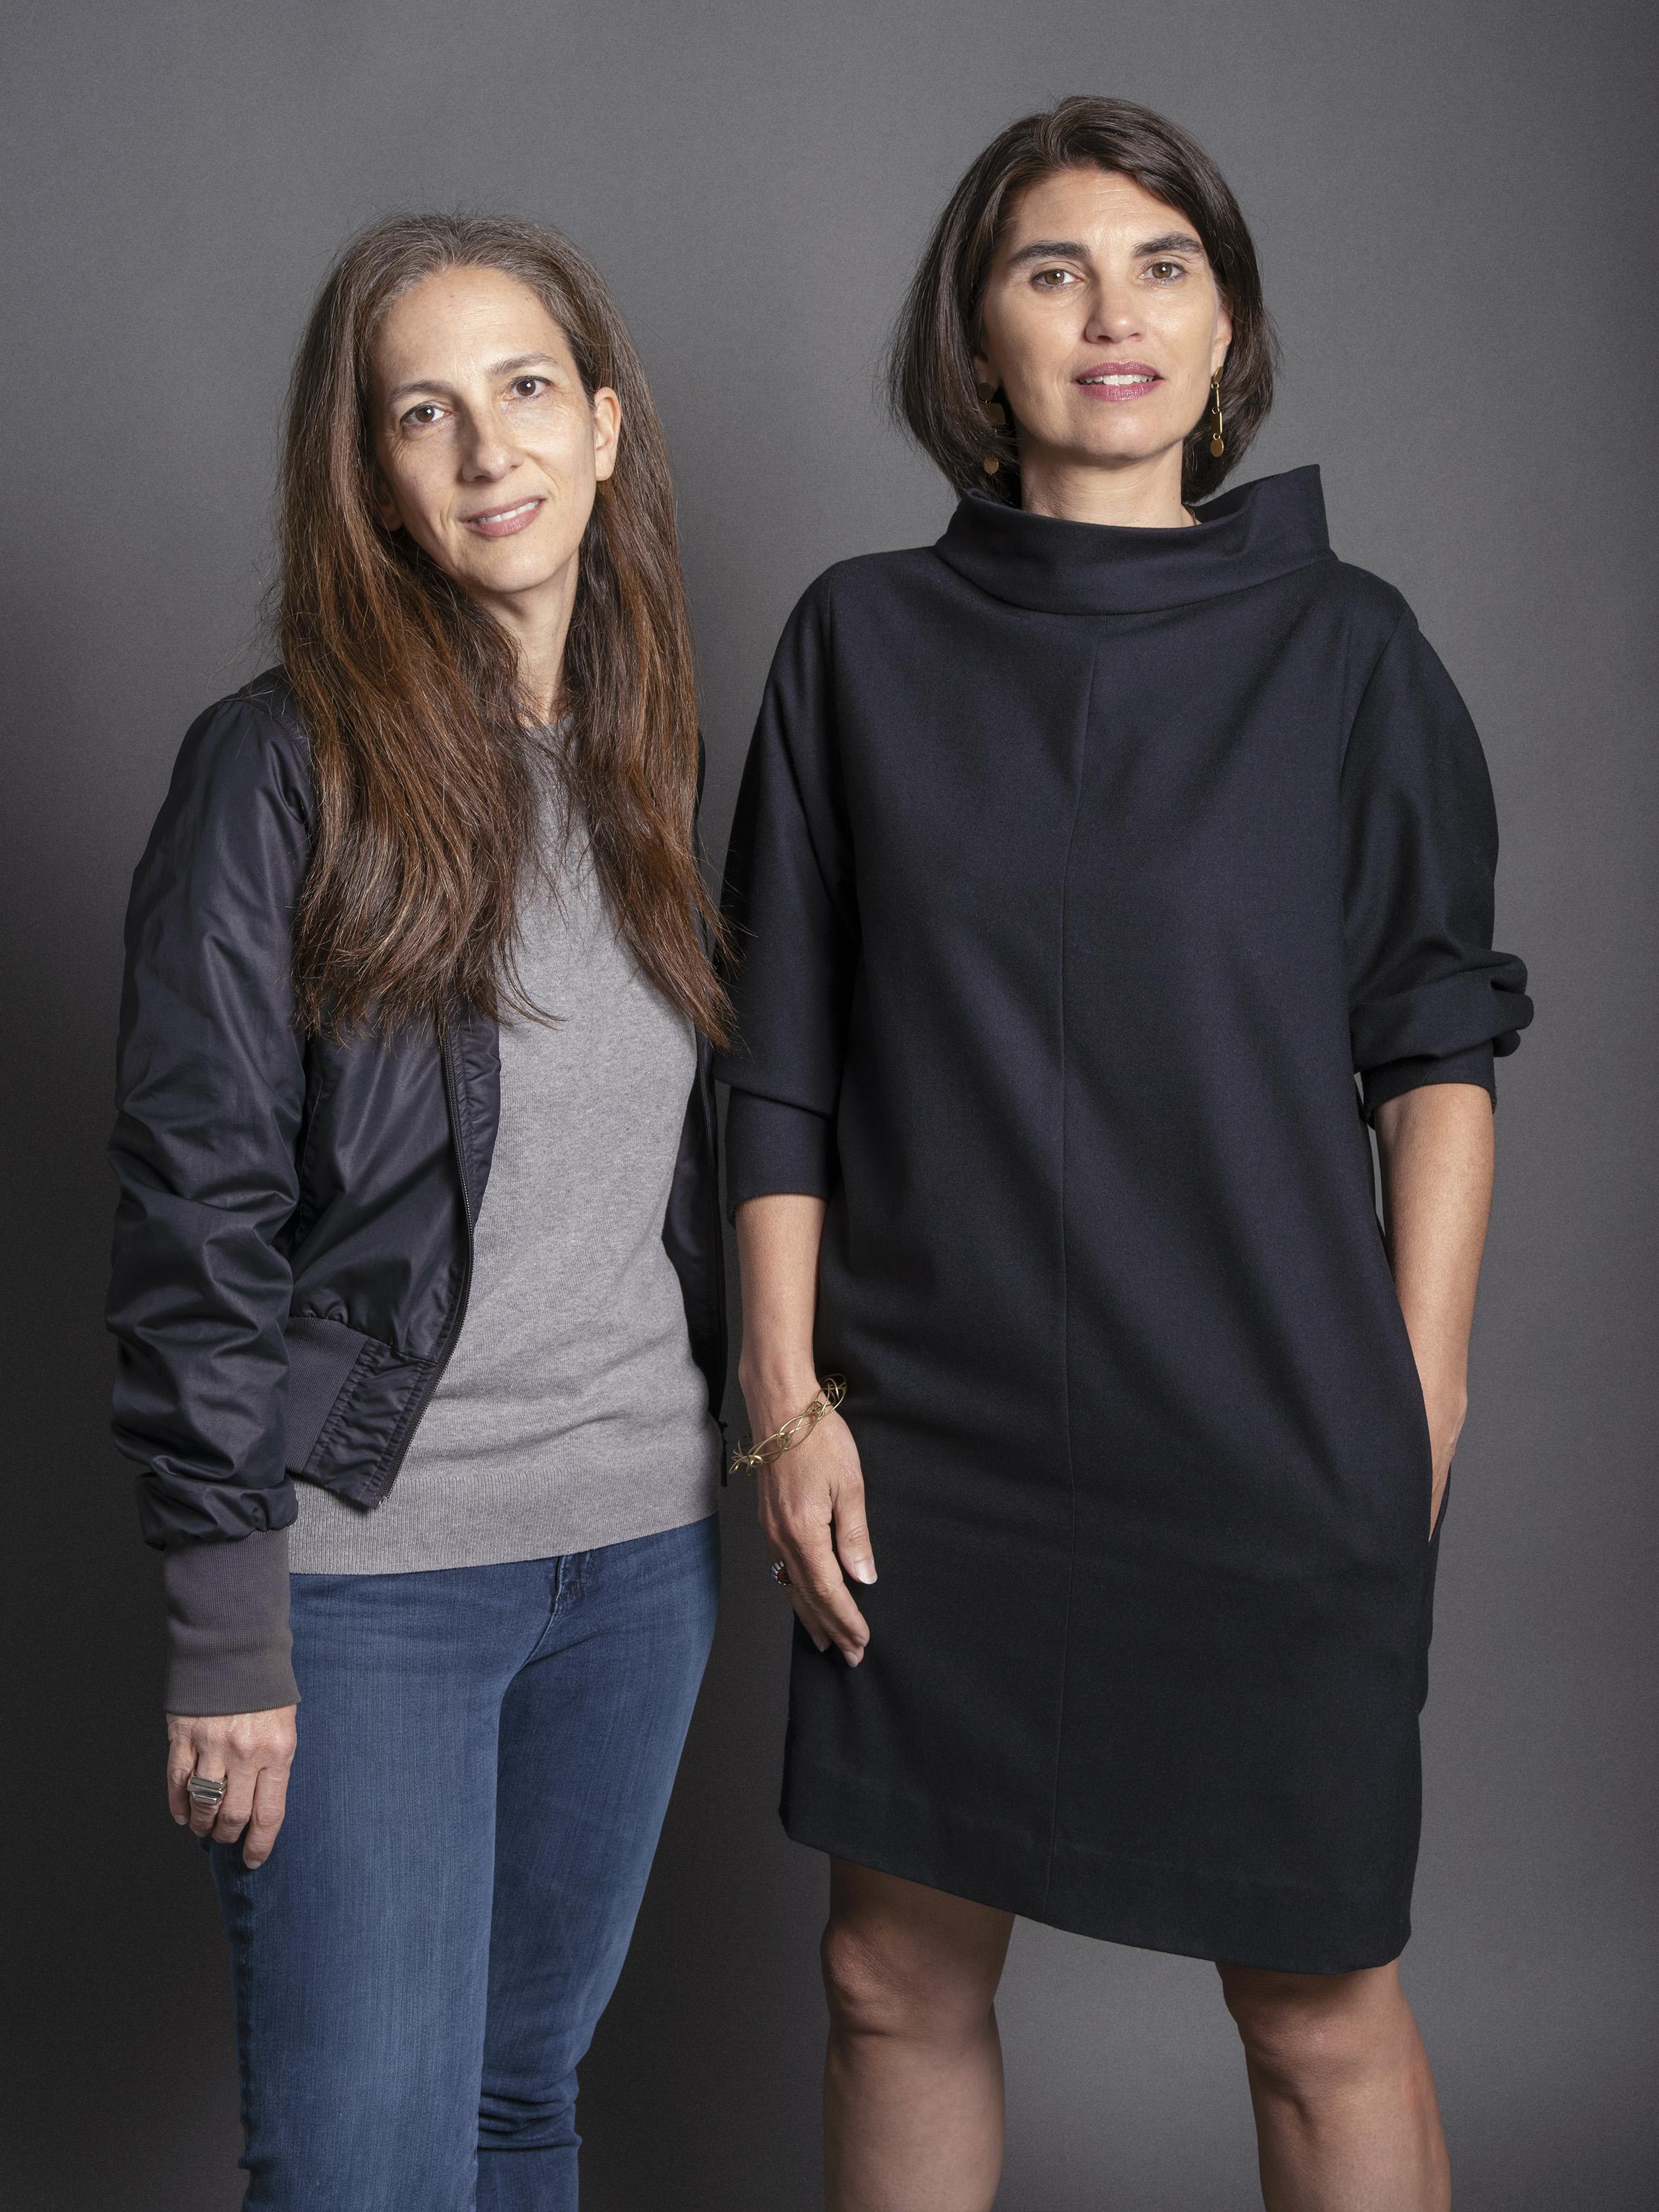 Kristen Sidell, AIA and Rudabeh Pakravan